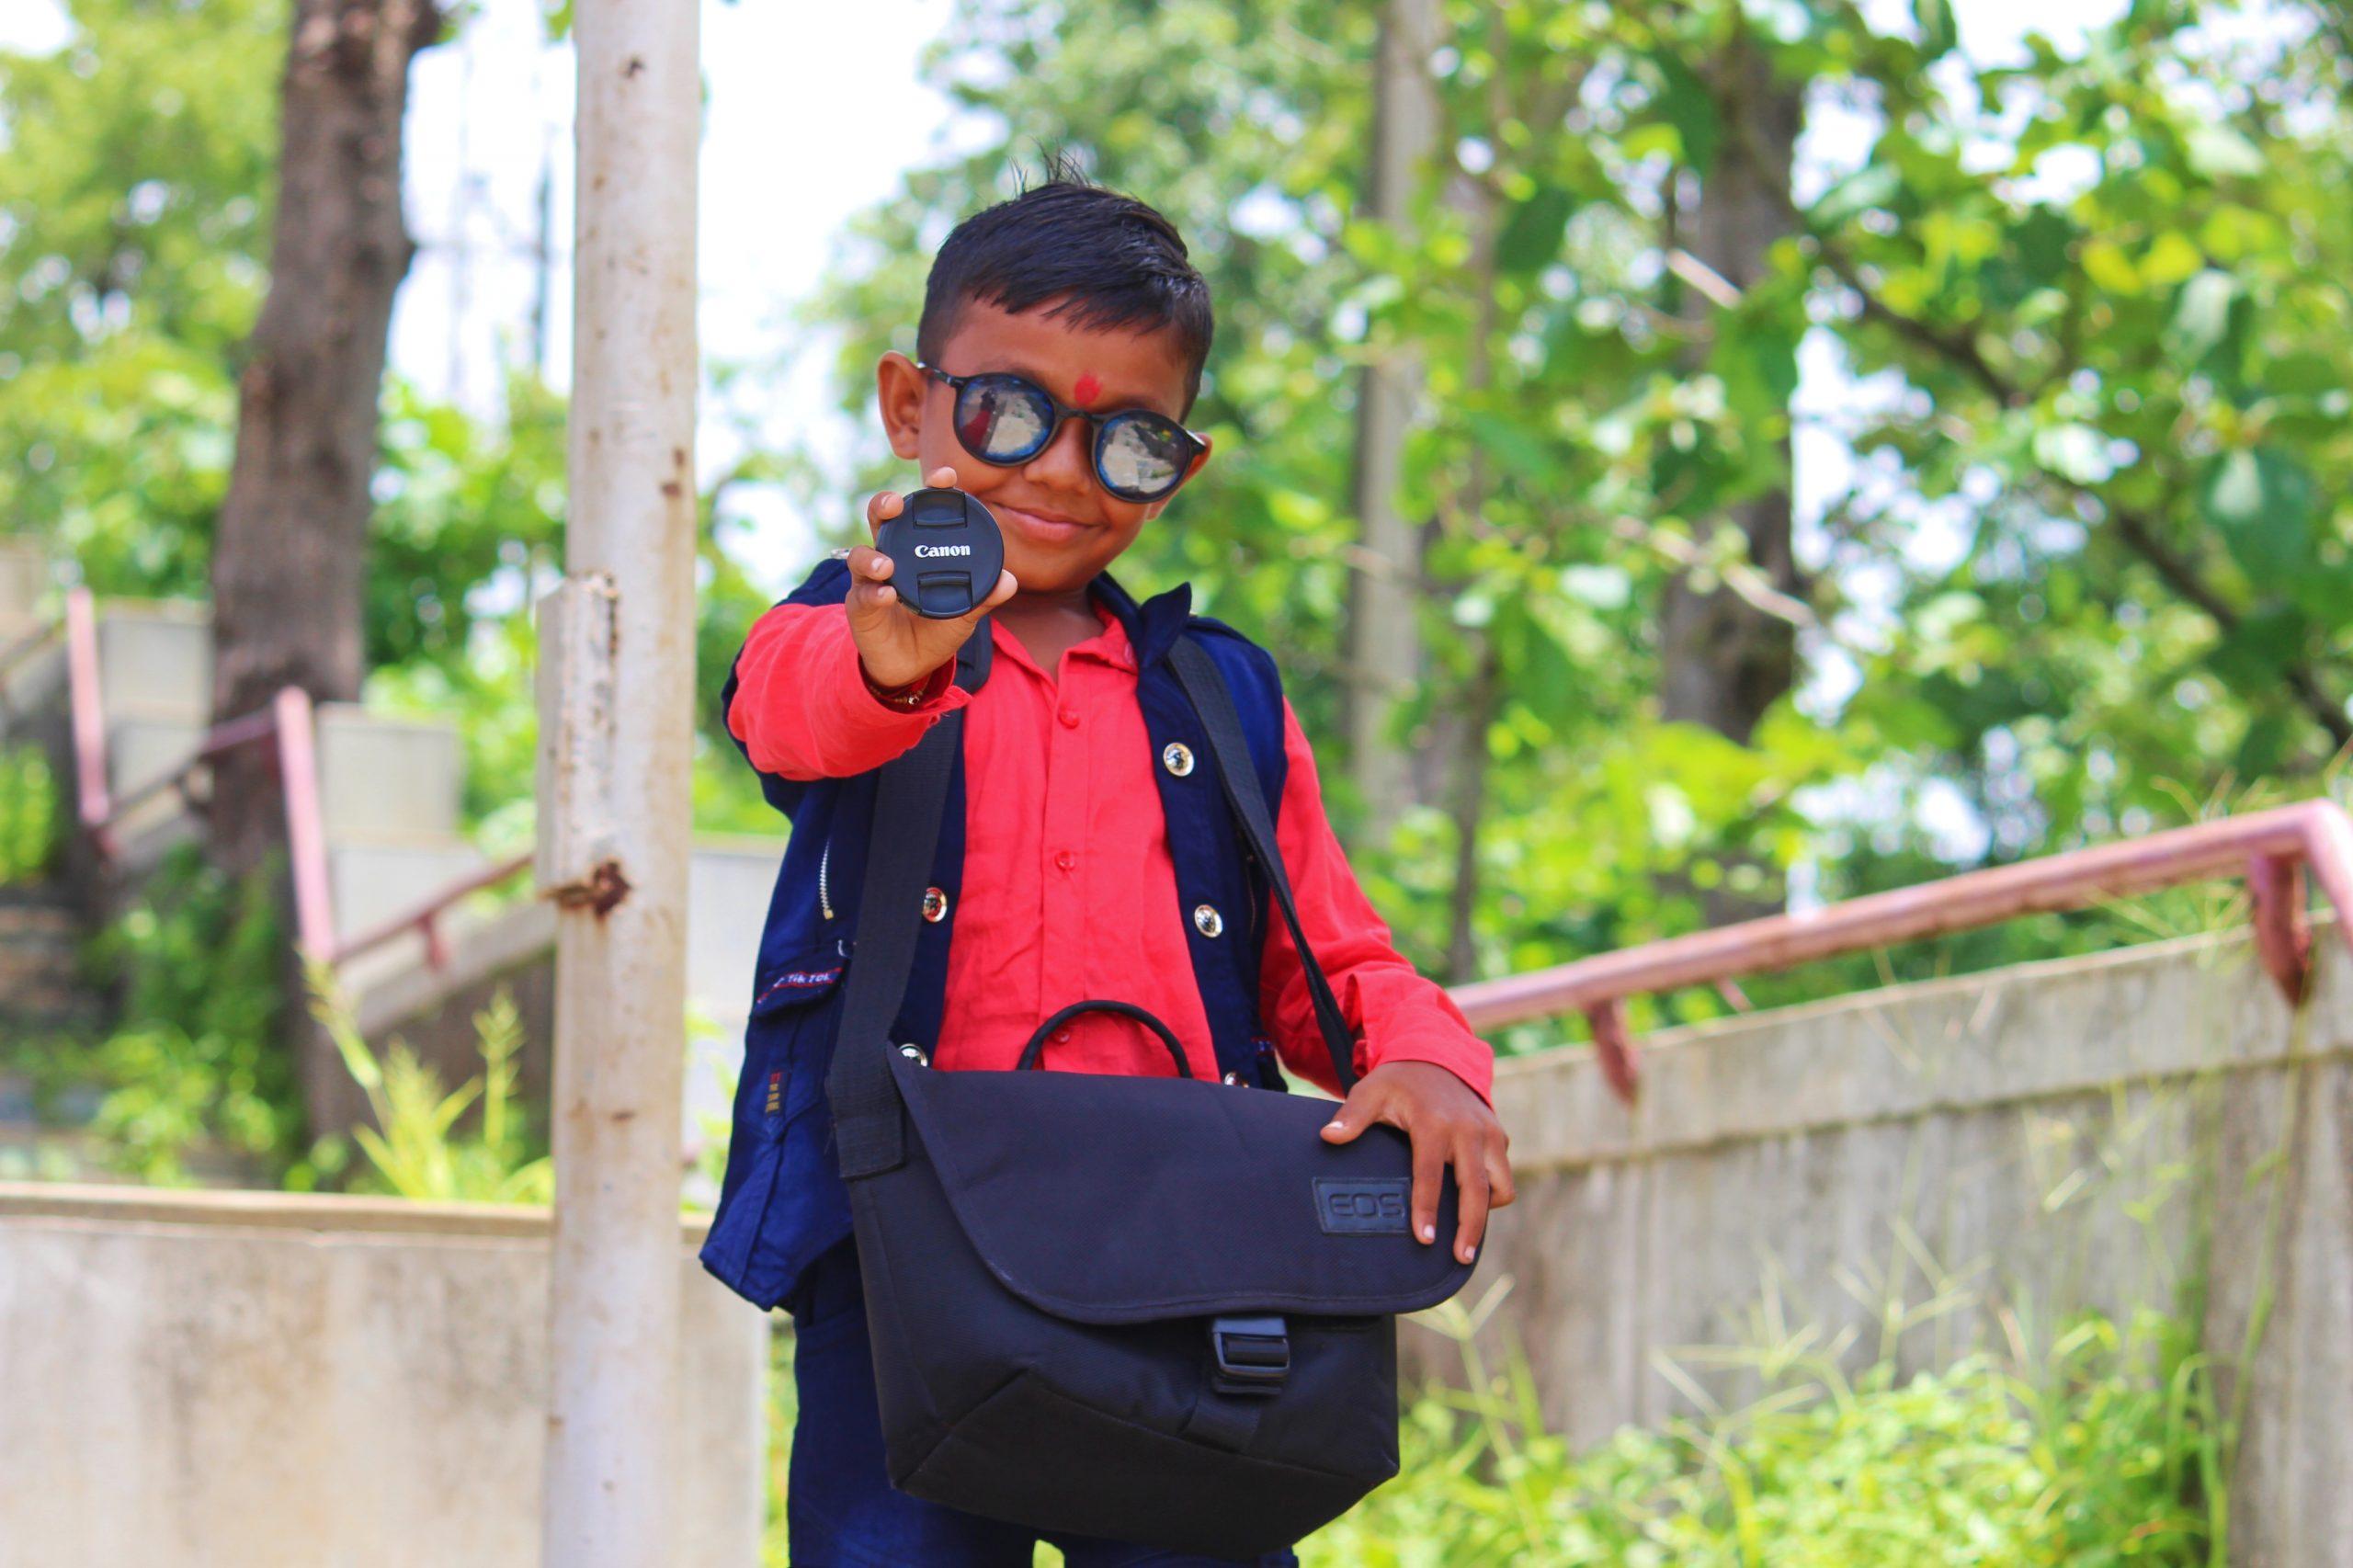 A little boy with lens cap